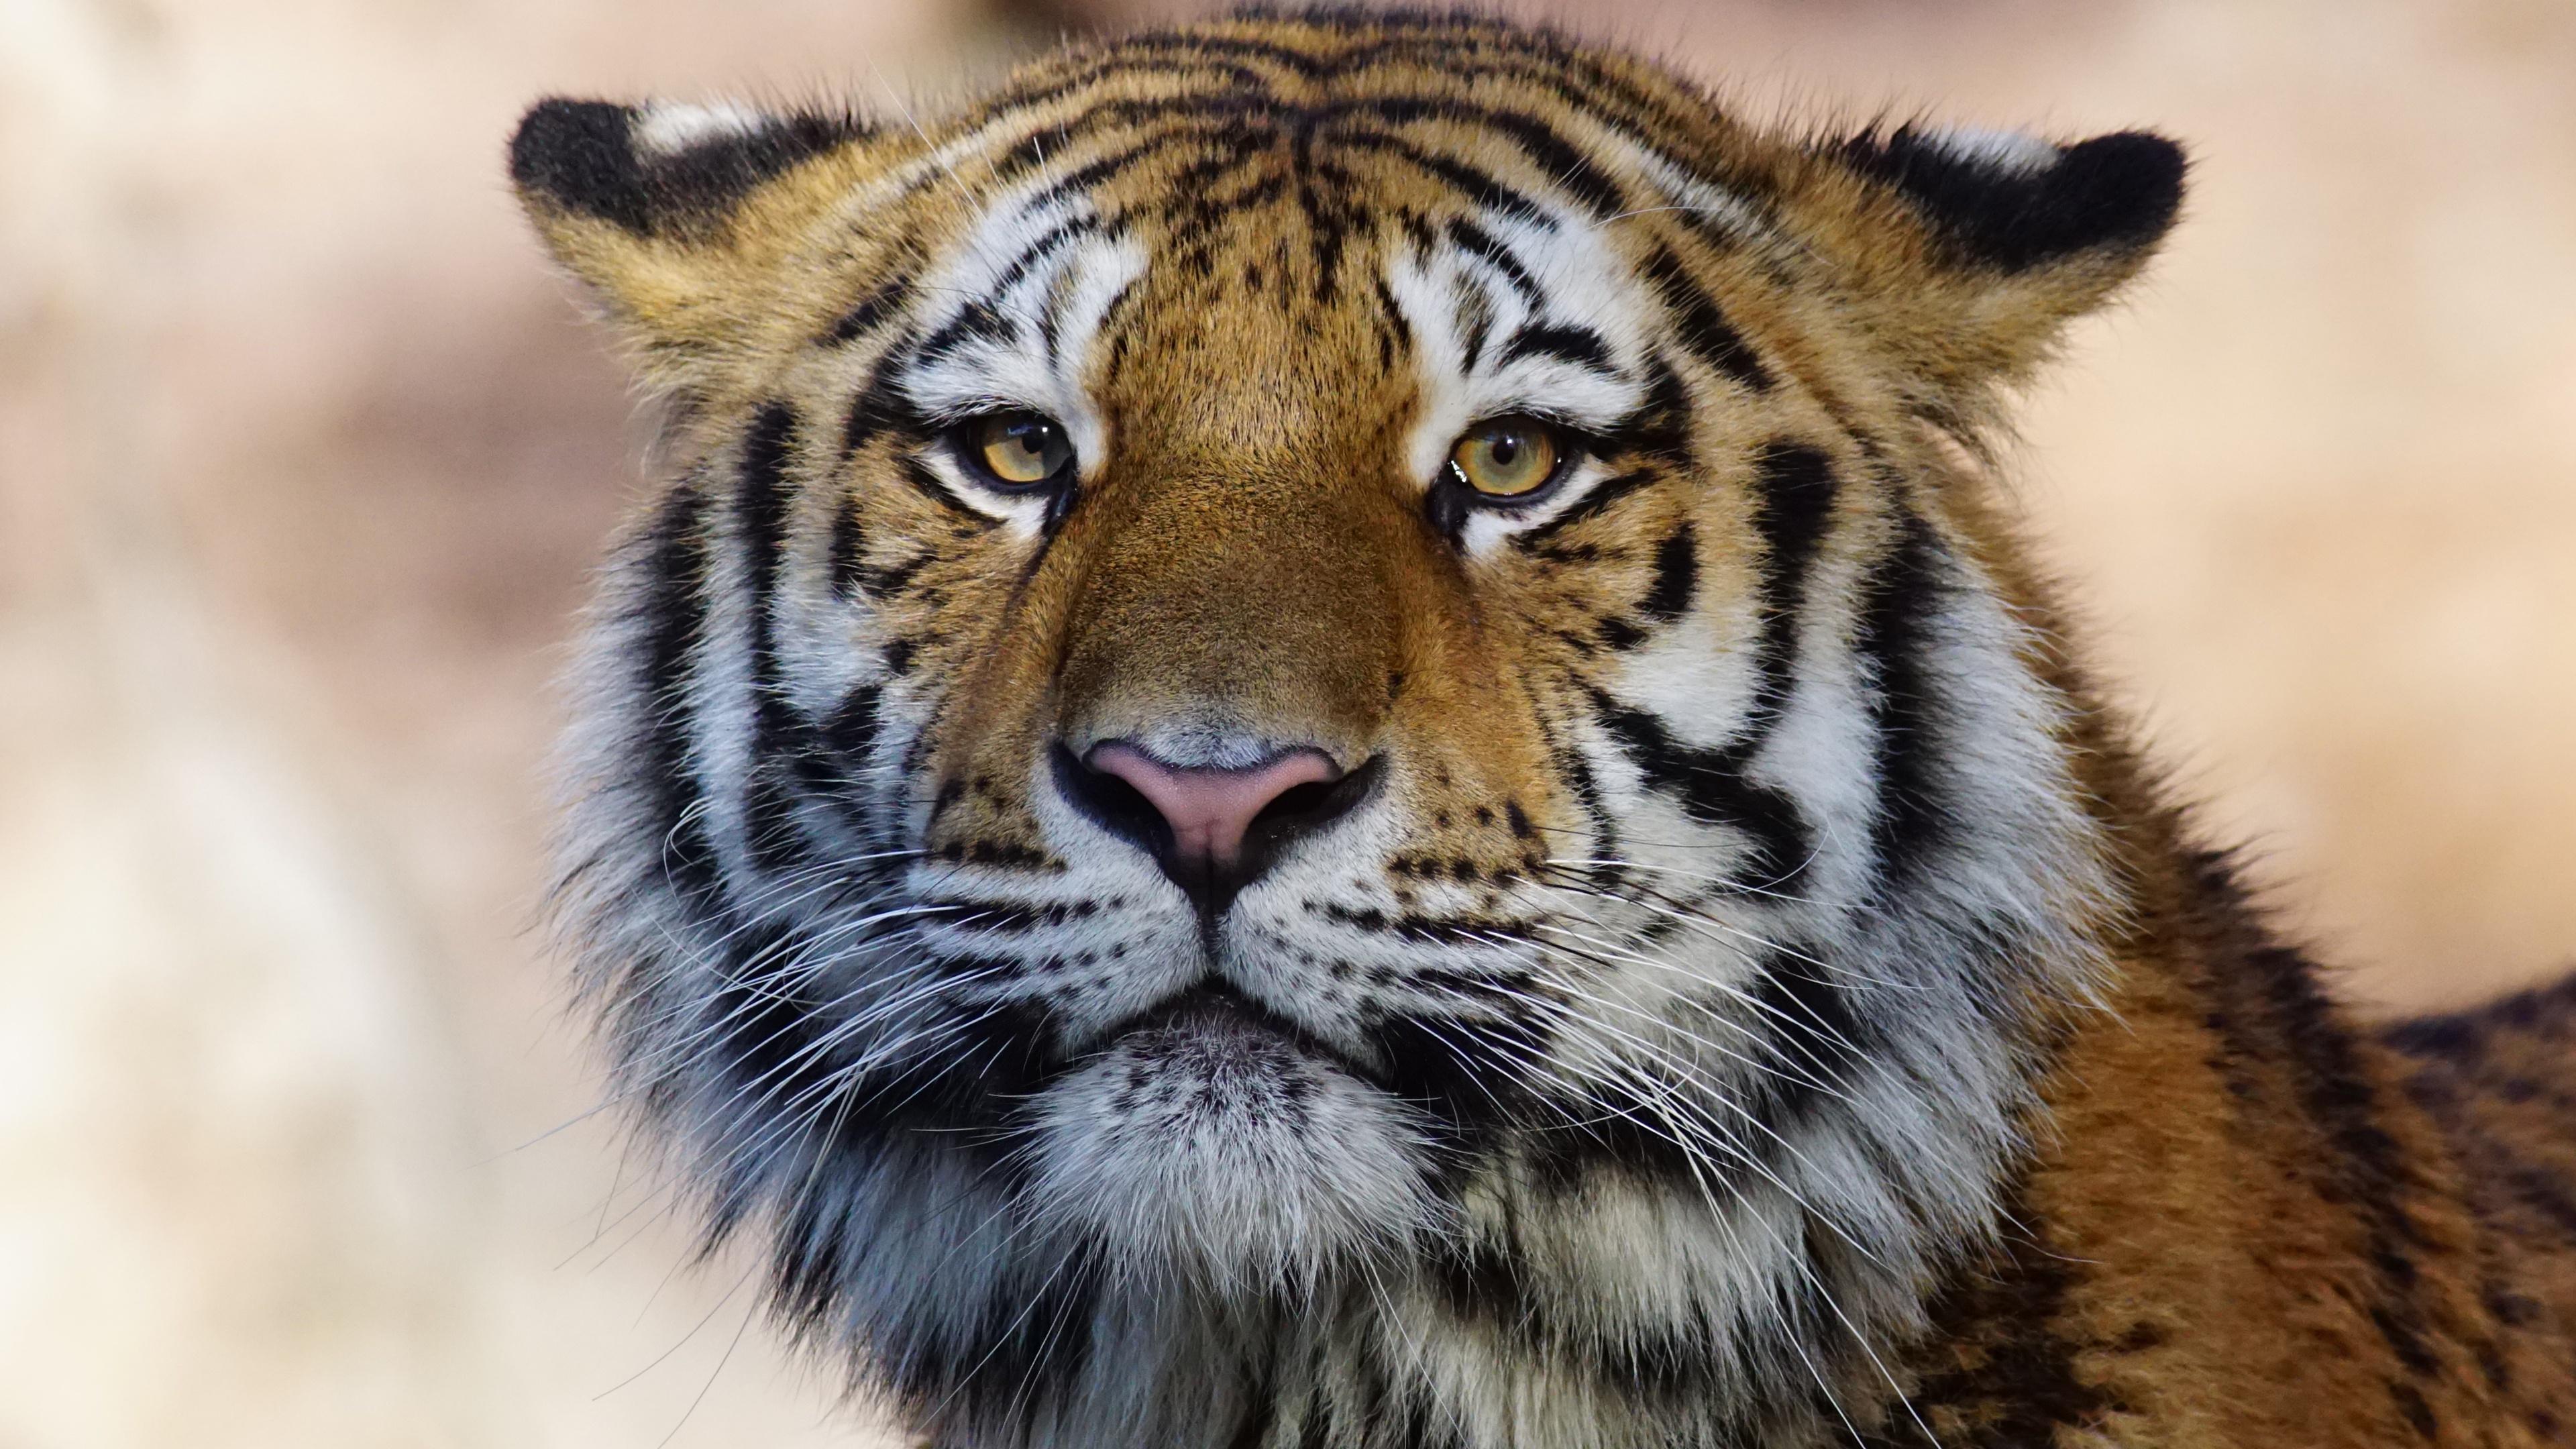 tiger wild animal 4k 1542239104 - Tiger Wild Animal 4k - wild wallpapers, tiger wallpapers, predator wallpapers, hd-wallpapers, animals wallpapers, 4k-wallpapers